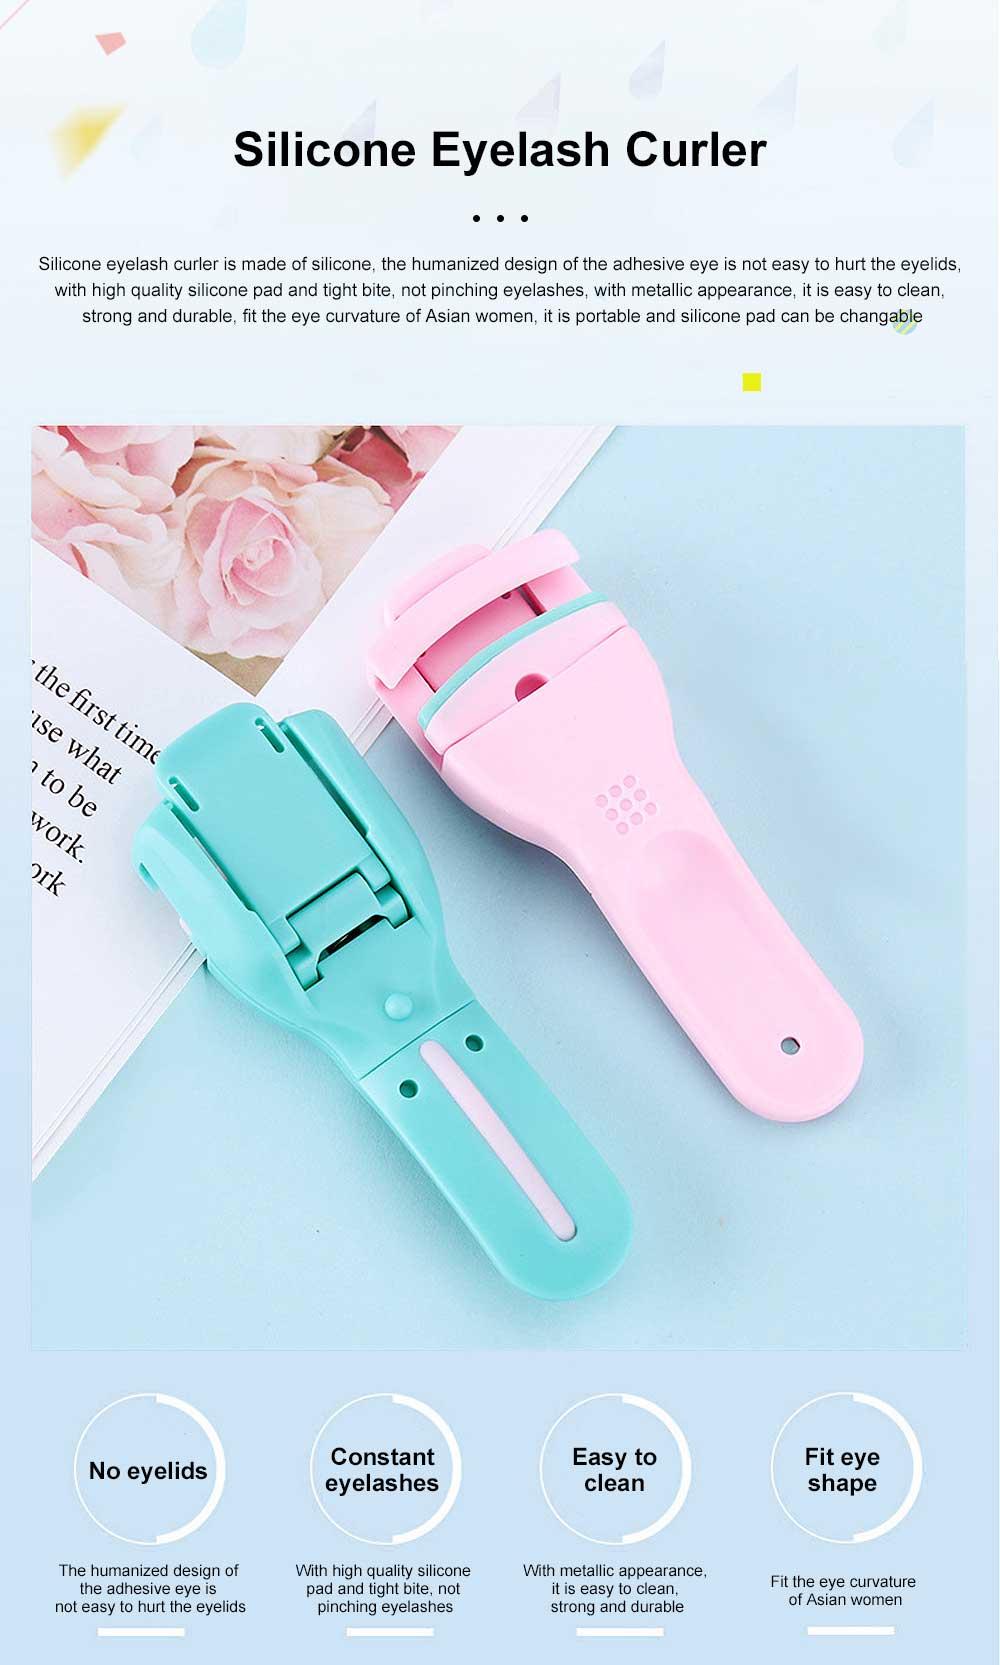 Silicone Eyelash Curler False Eyelash Extension Applicator Tool, Wholesale Portable Lightweight Bling Eyelash Curler 0